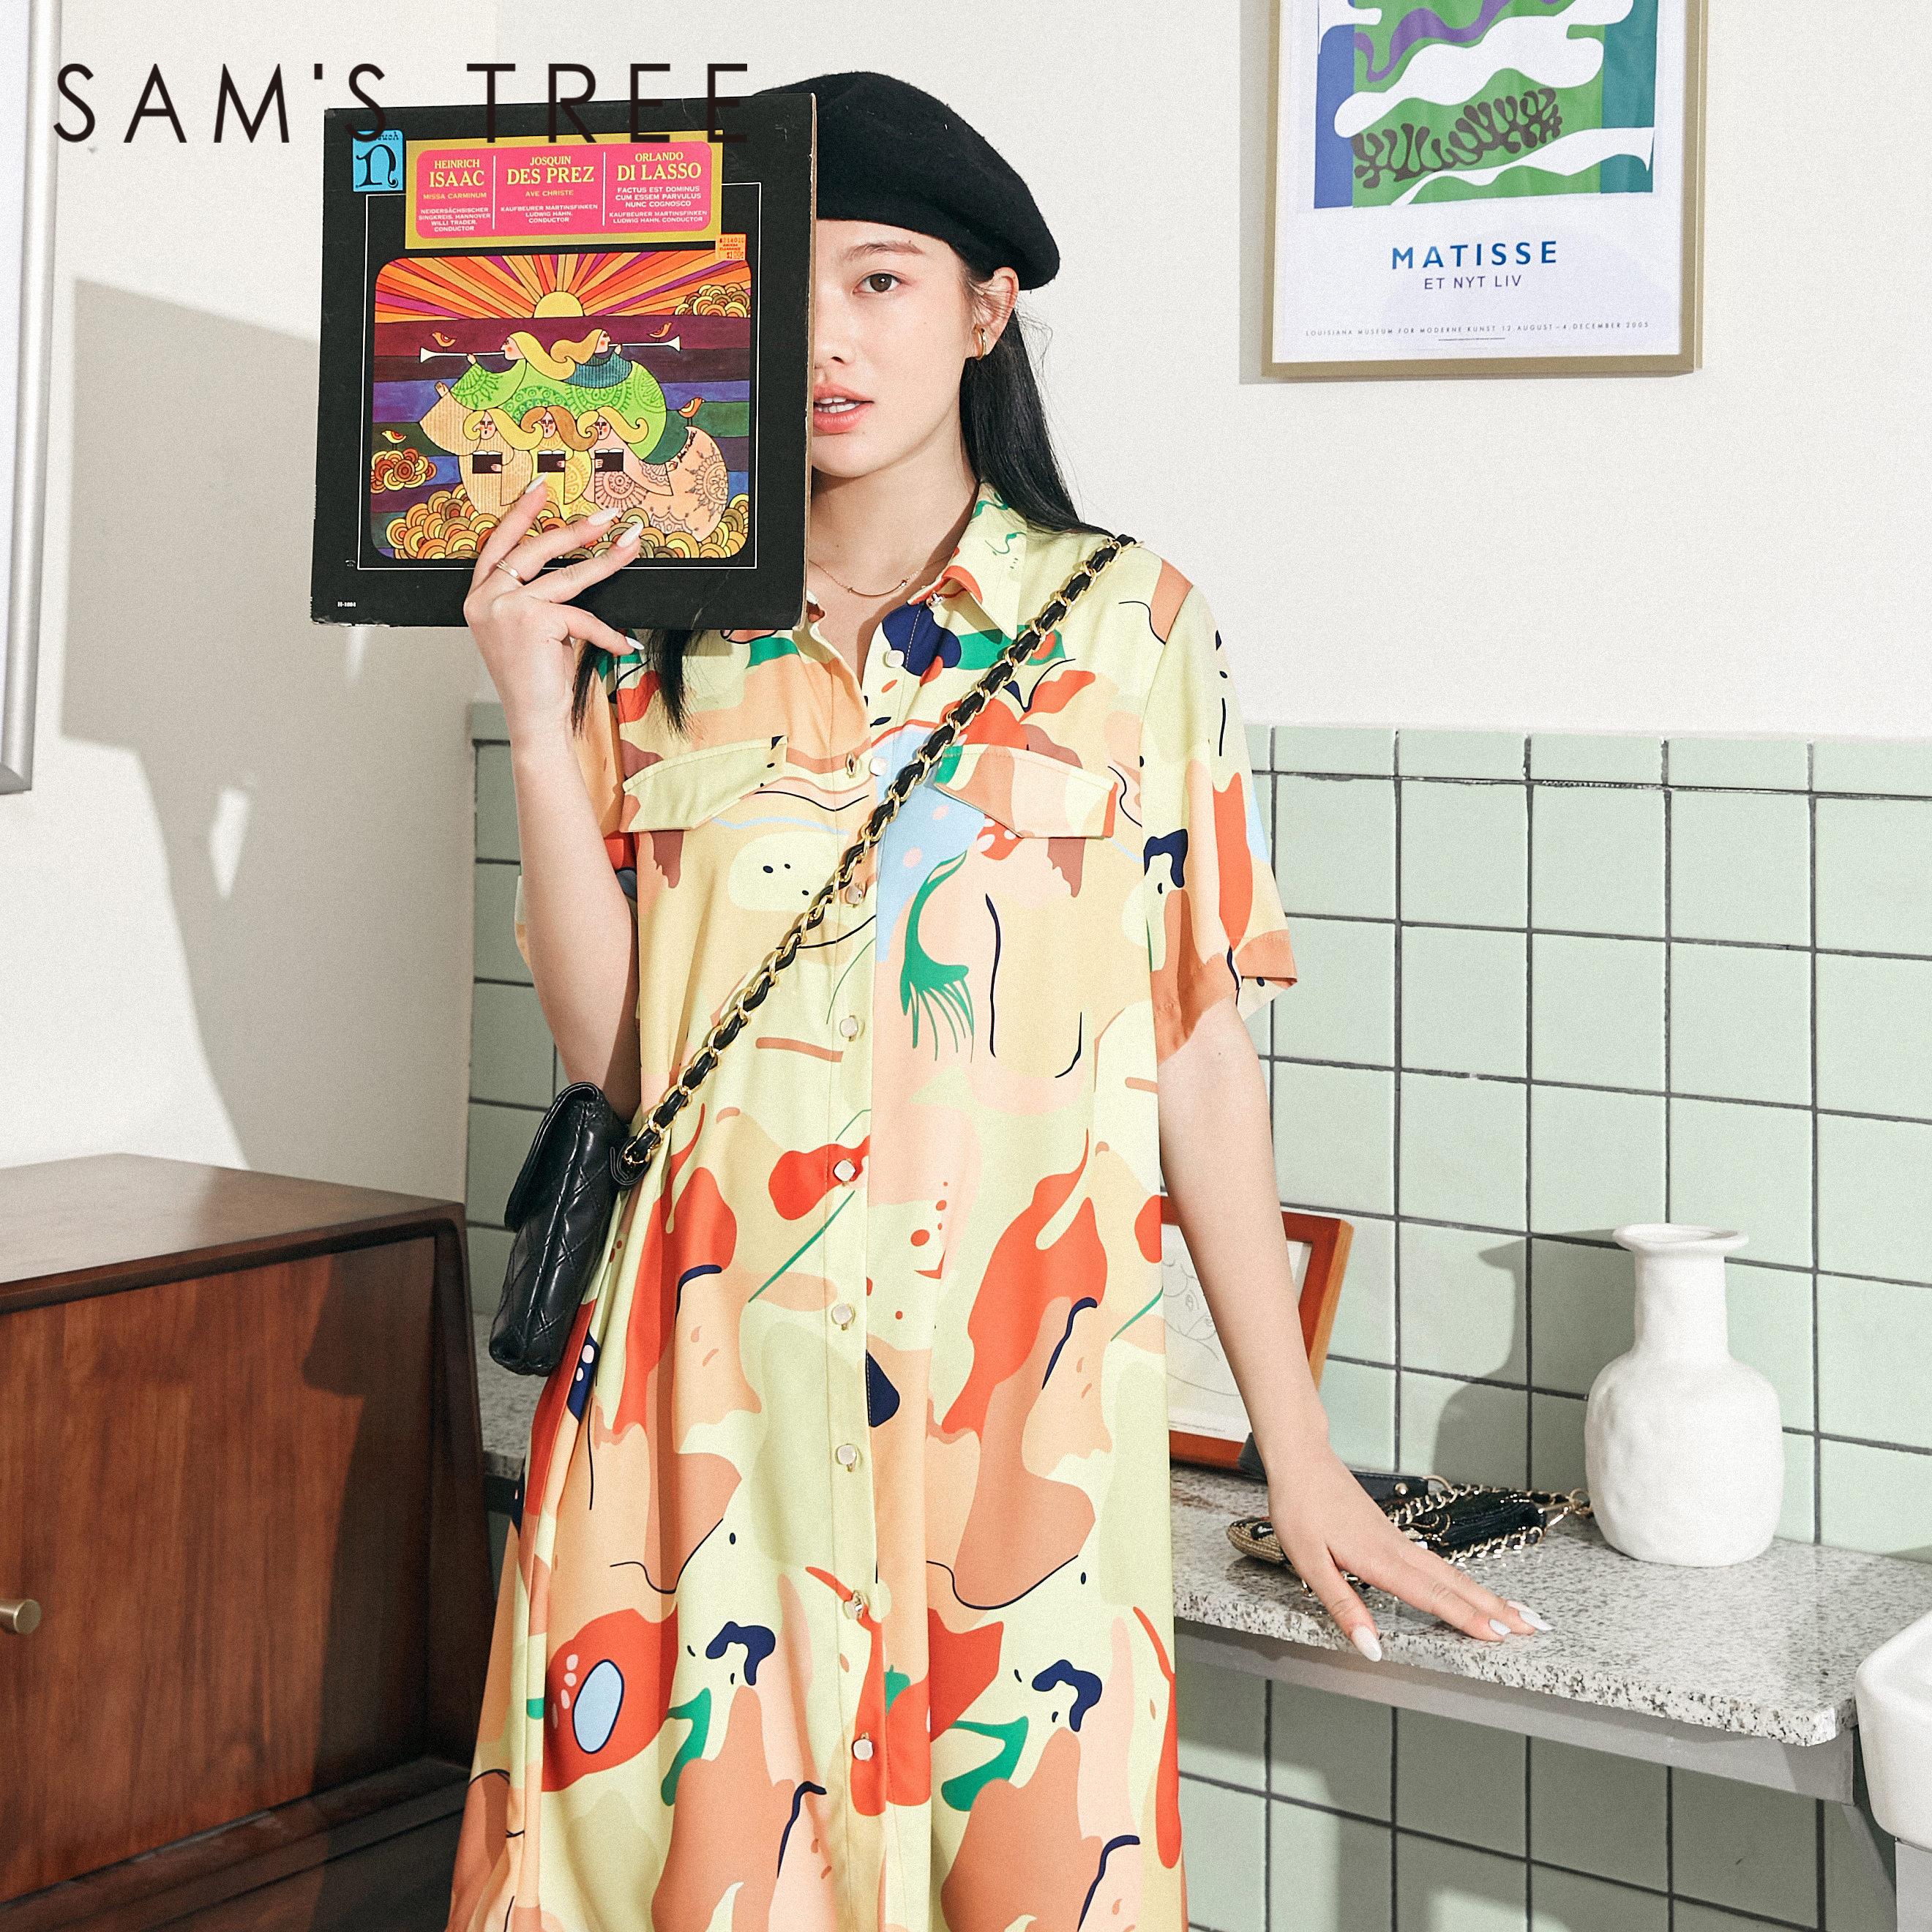 SAMS TREE Yellow Oil Painting Chic Button Casual Women Chiffon Shirts Dresses 2020 Summer Graphic Korean Ladies Holiday Dress